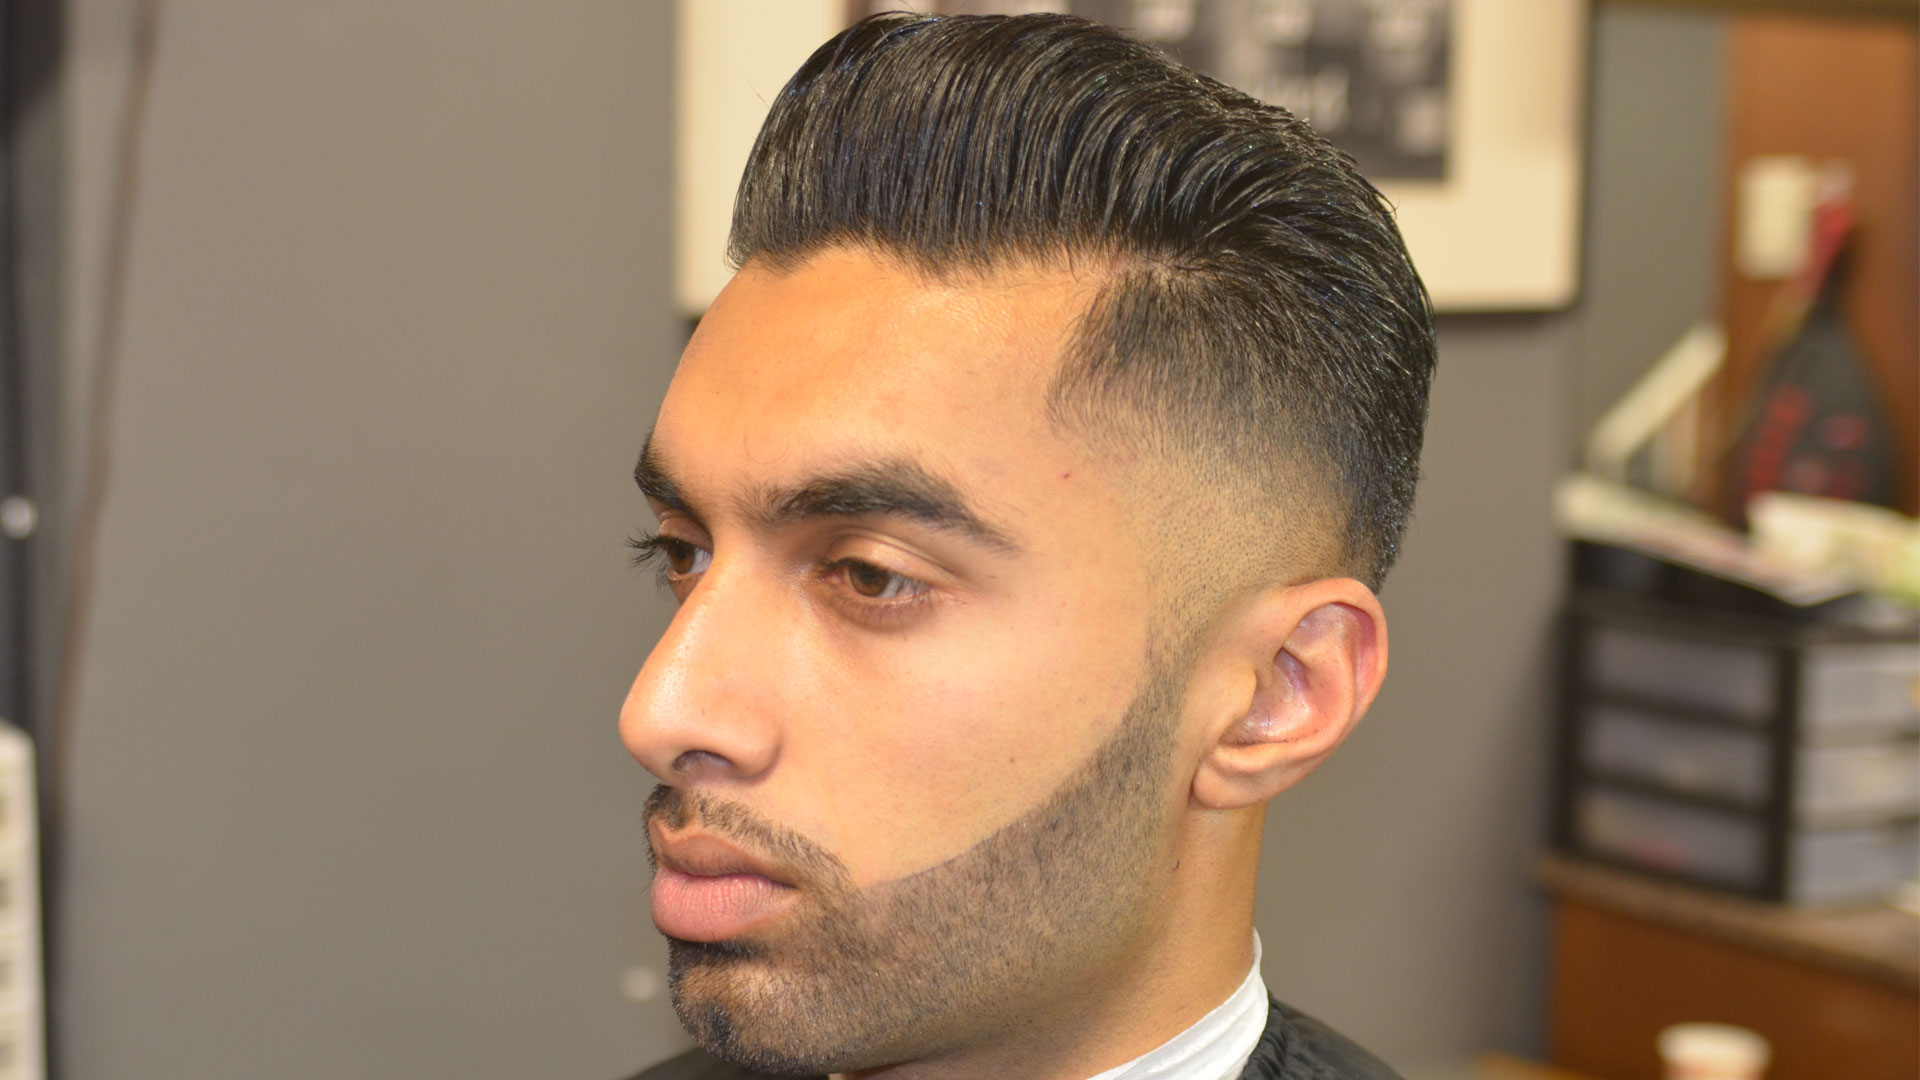 Enjoyable Premium Pompadour W Low Taper Bald Fade Amp Beard Dave Diggs Short Hairstyles Gunalazisus